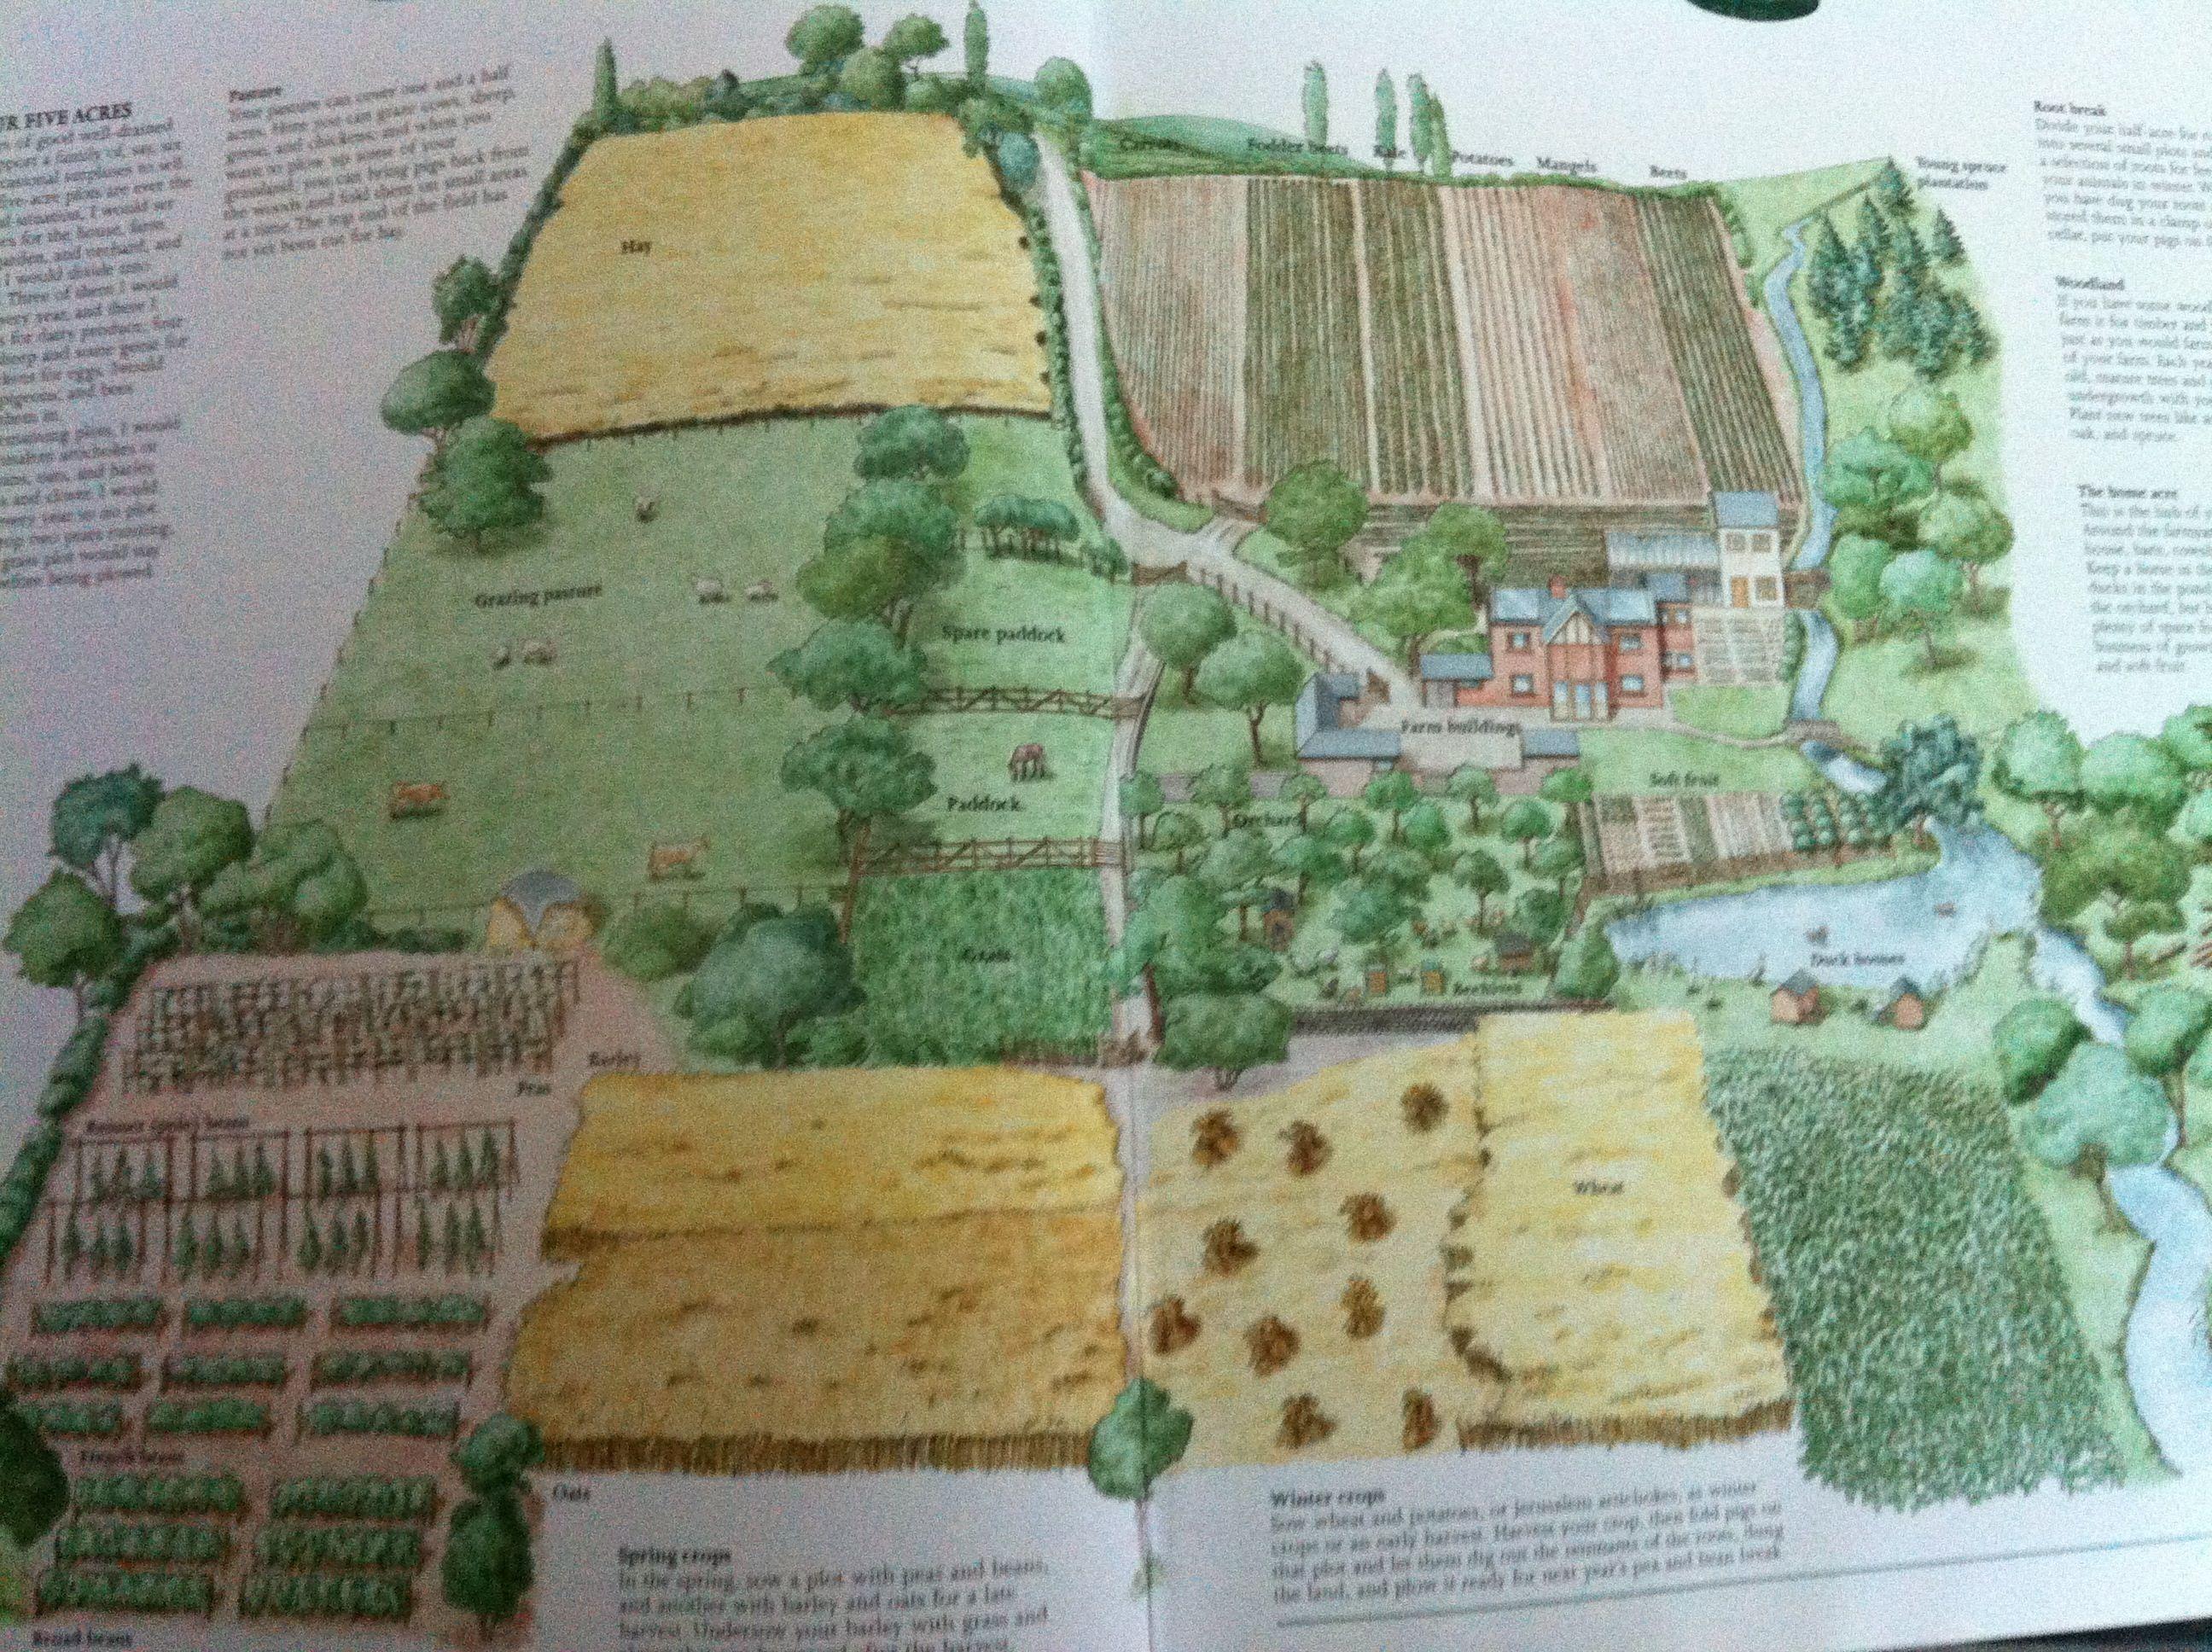 5 Acres Independance Homestead Layout Farm Layout Horse Farm Layout